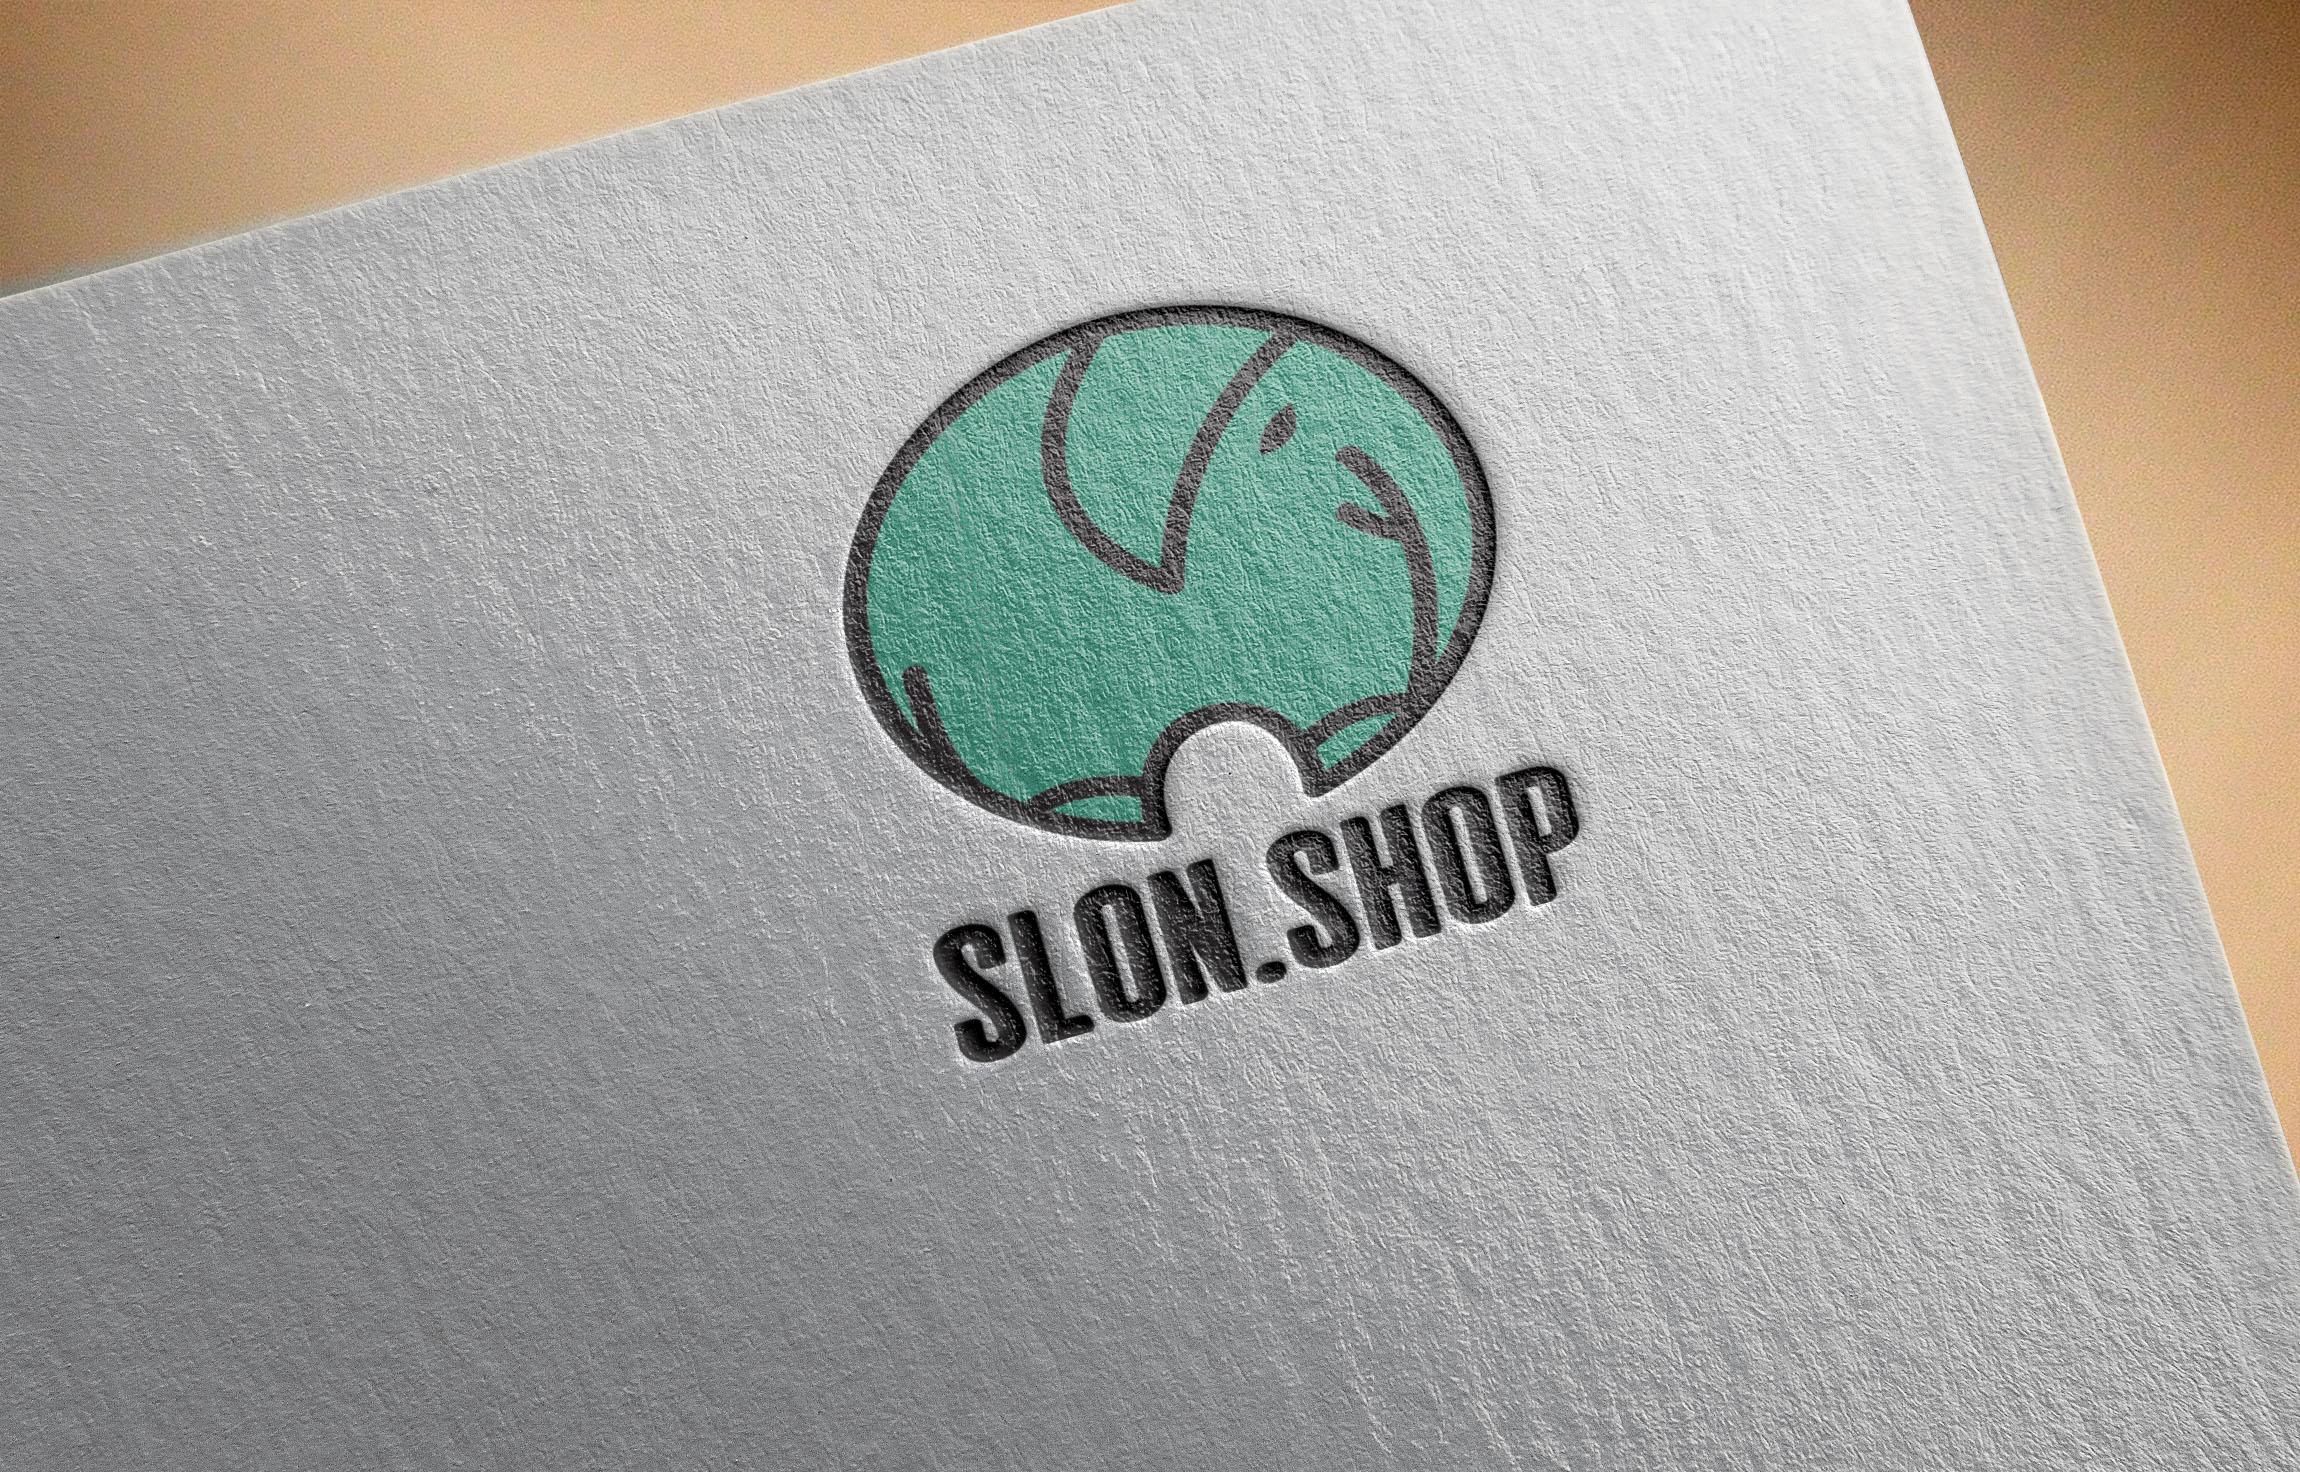 Разработать логотип и фирменный стиль интернет-магазина  фото f_631598f1cc2563e6.jpg